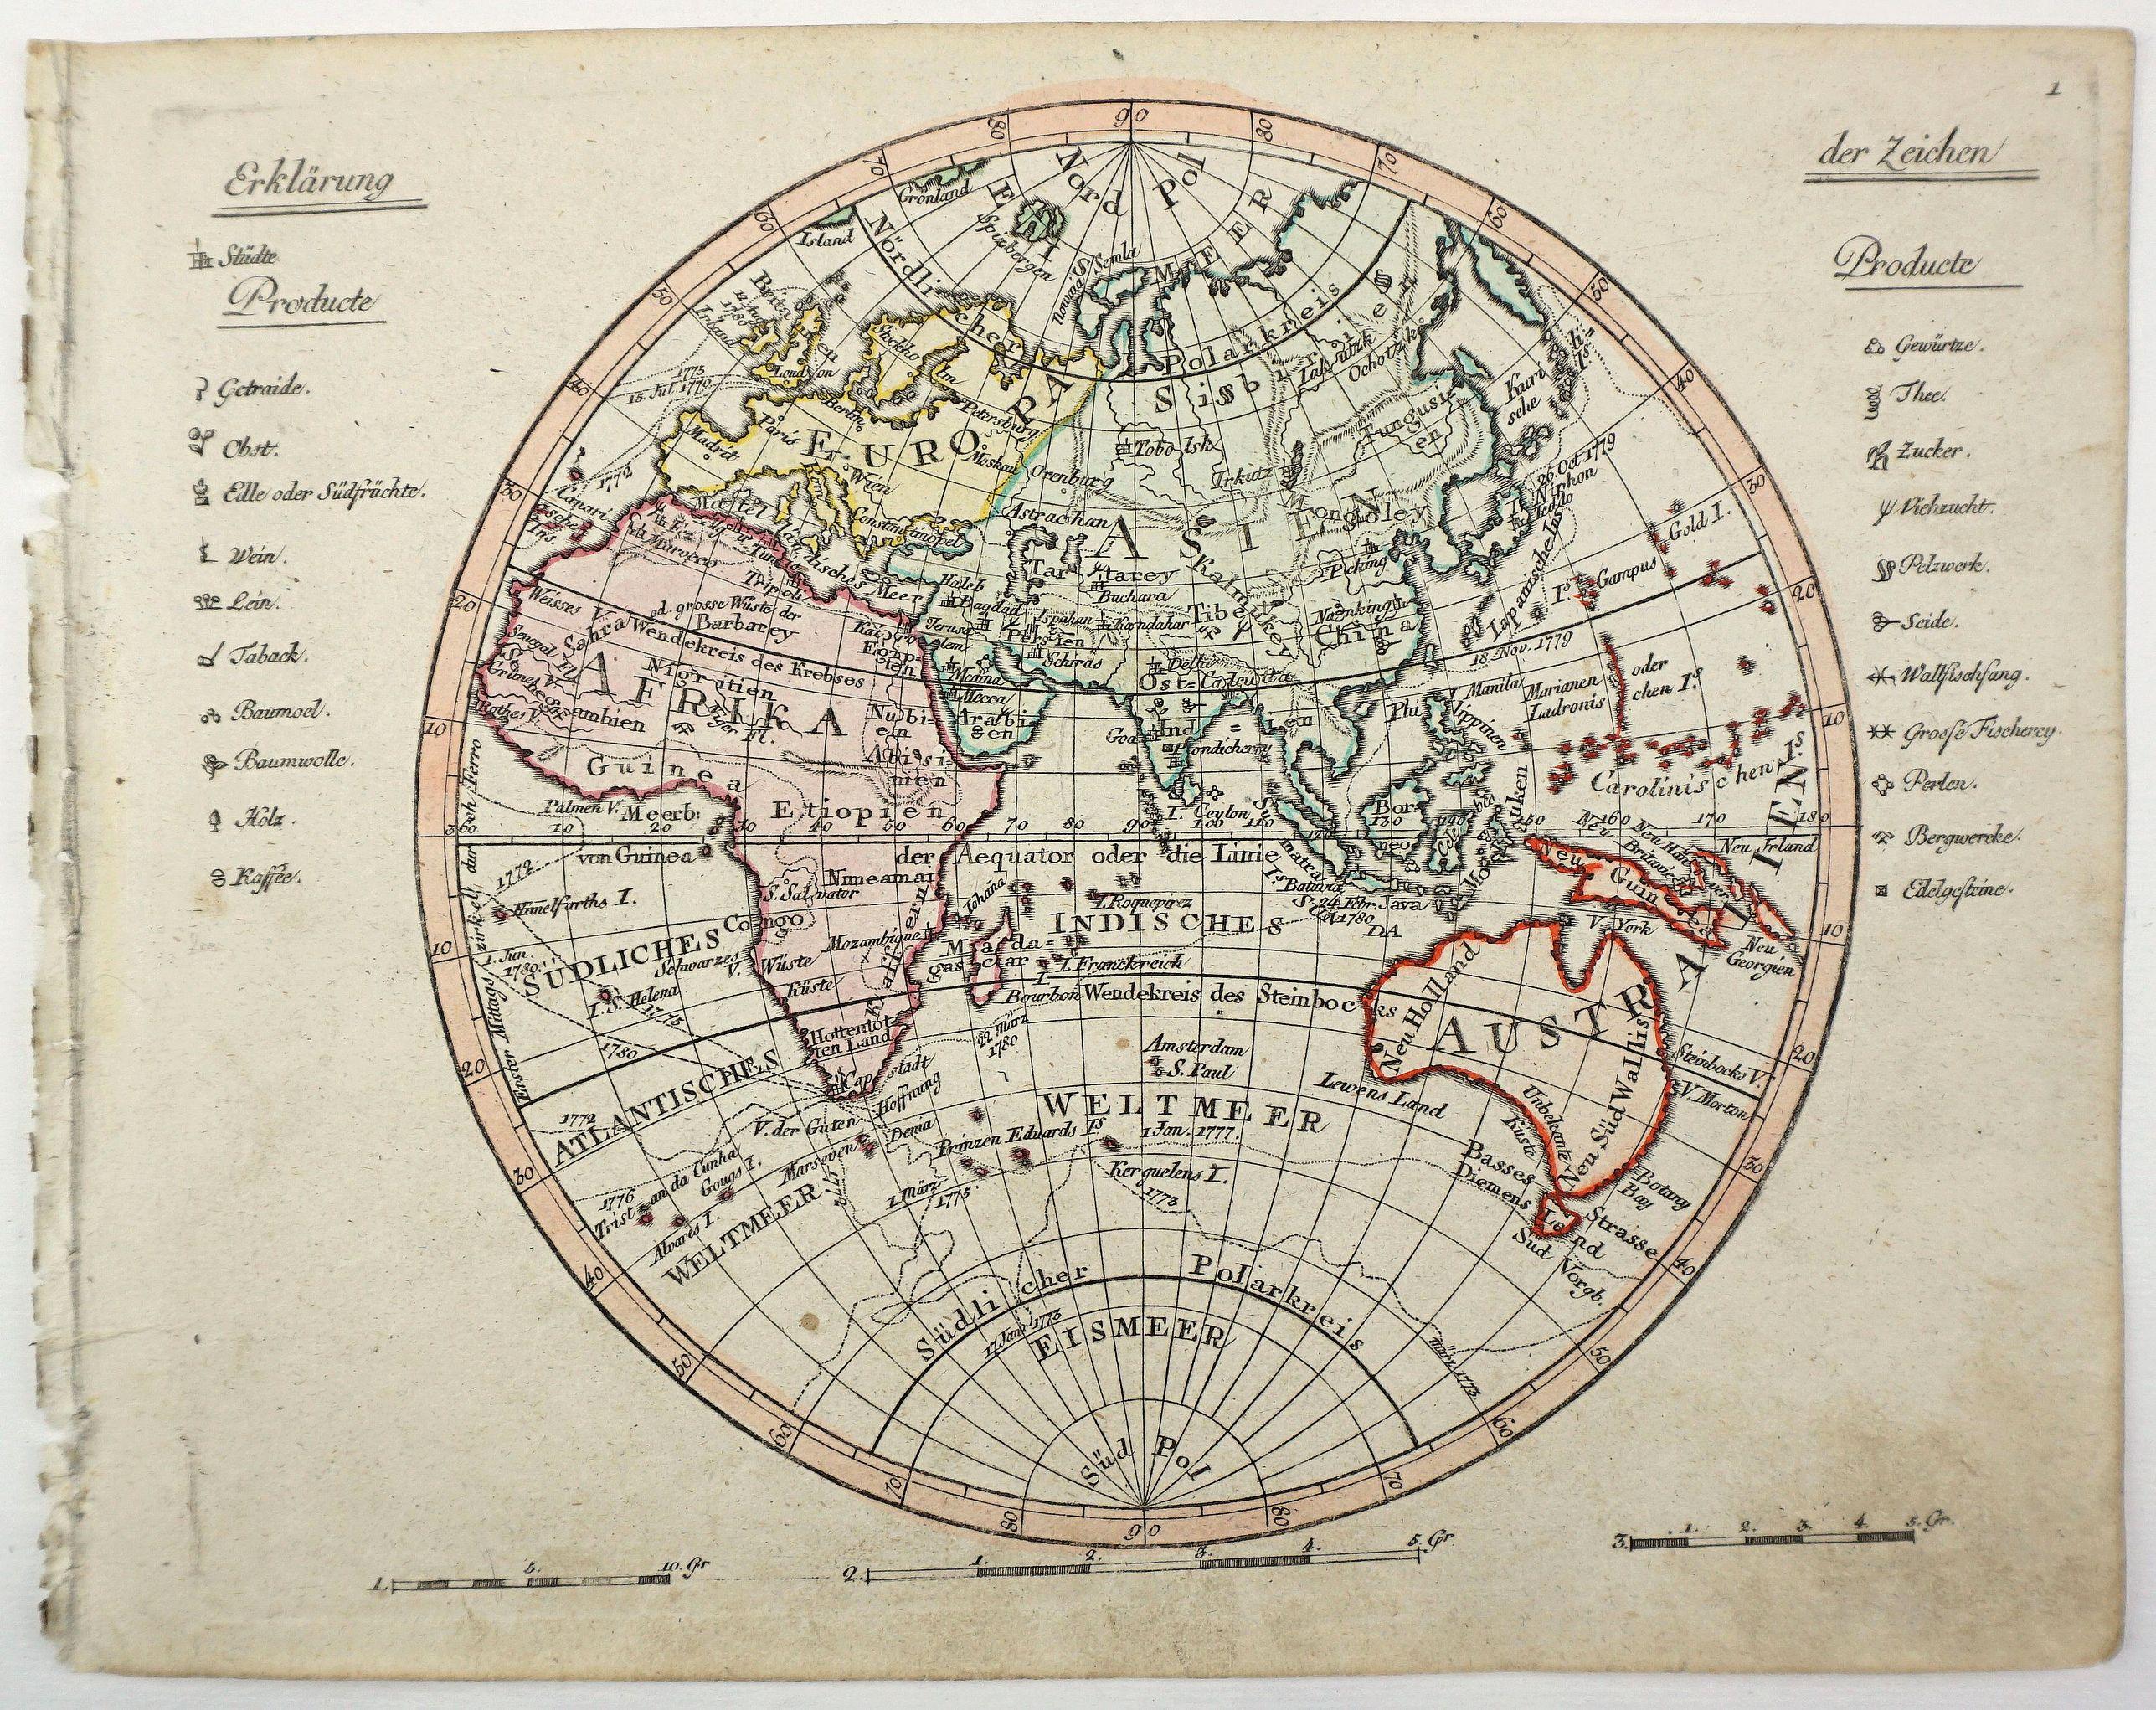 WALCH, J. - [Eastern Hemisphere].